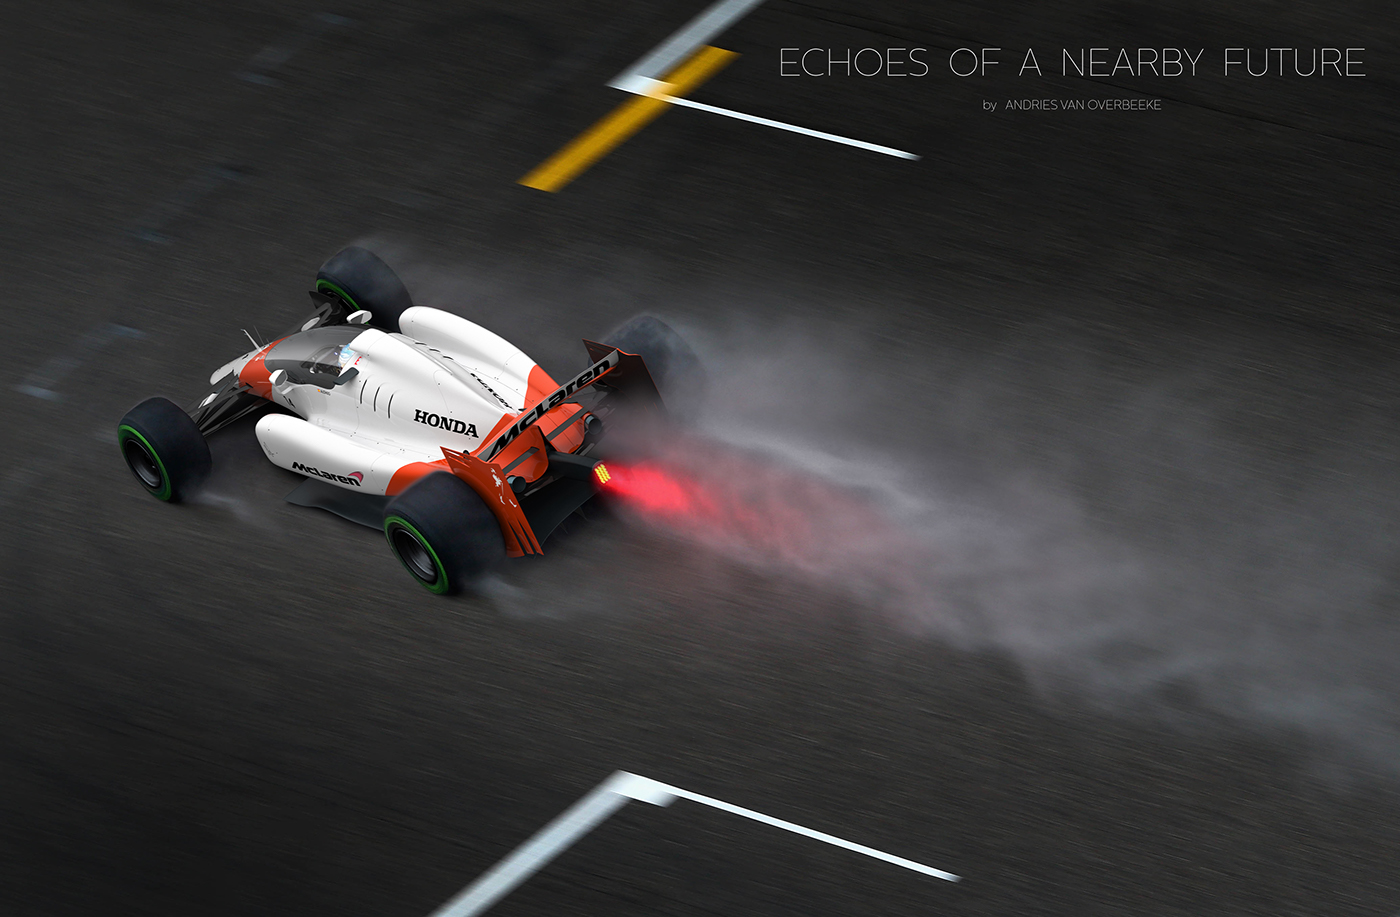 McLaren Honda Formula 1 closed cockpit concept by Andries van Overbeeke